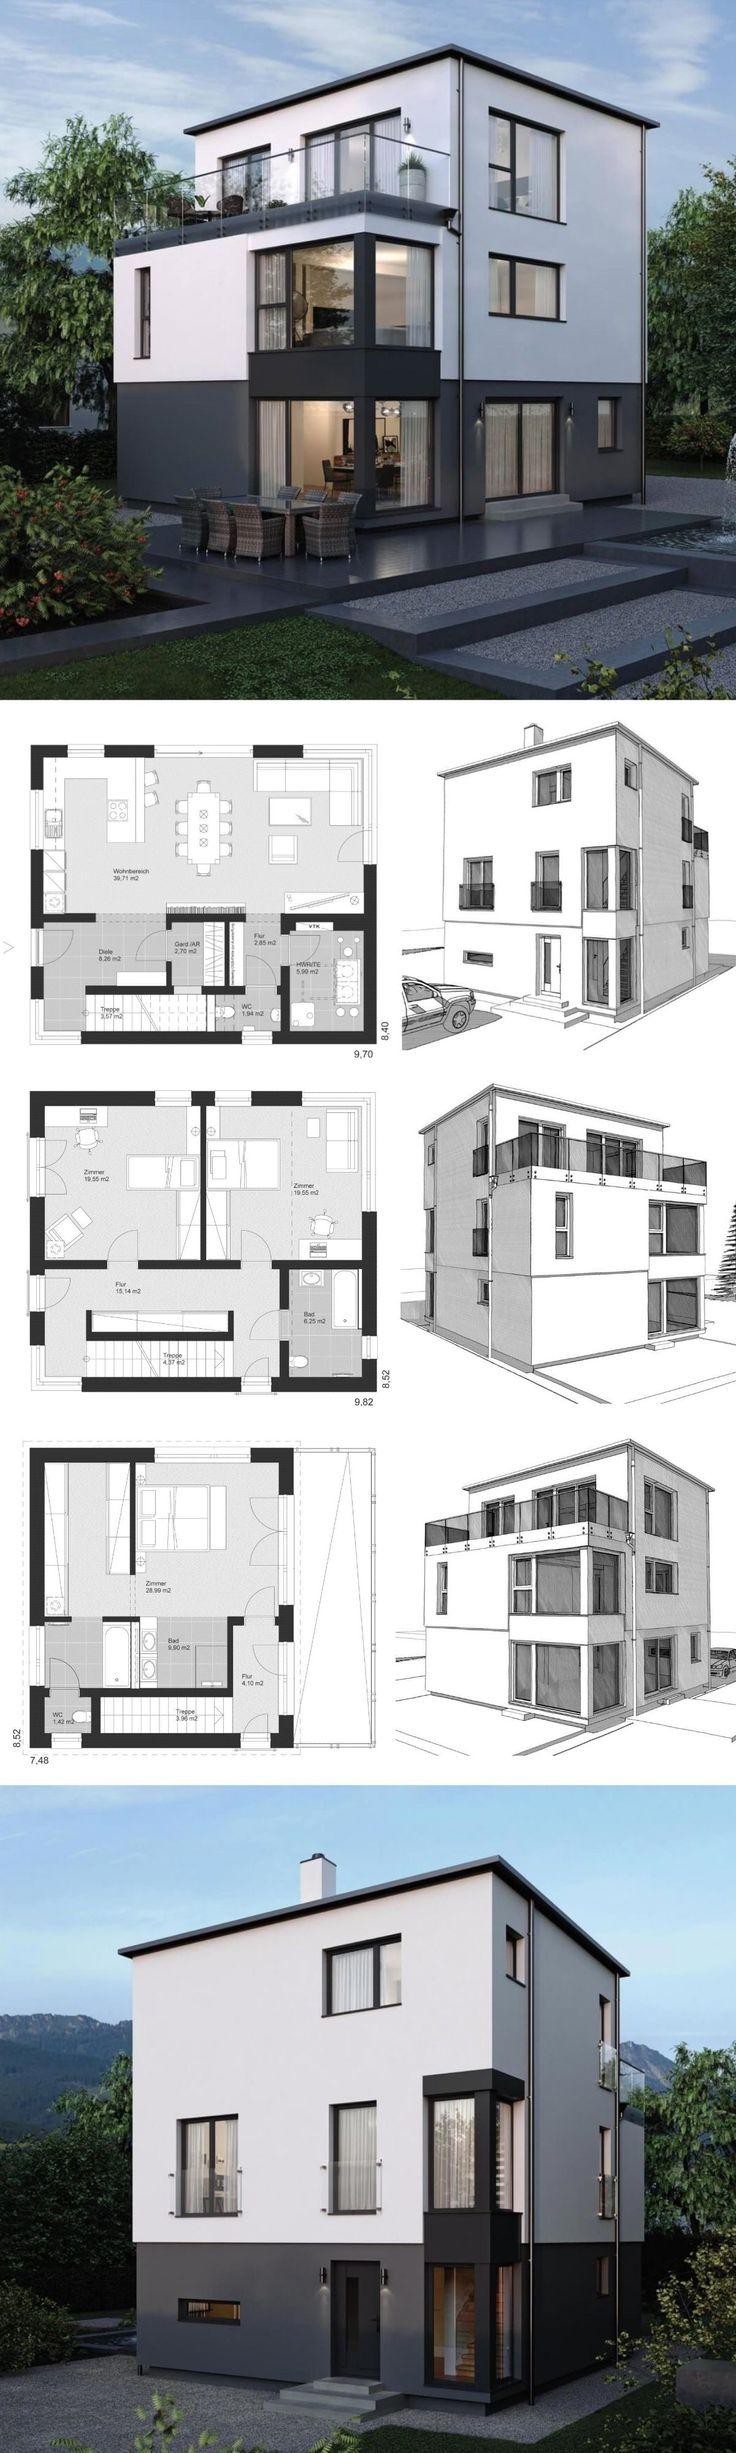 Modern Architecture Design House Plans ELK Haus 17…